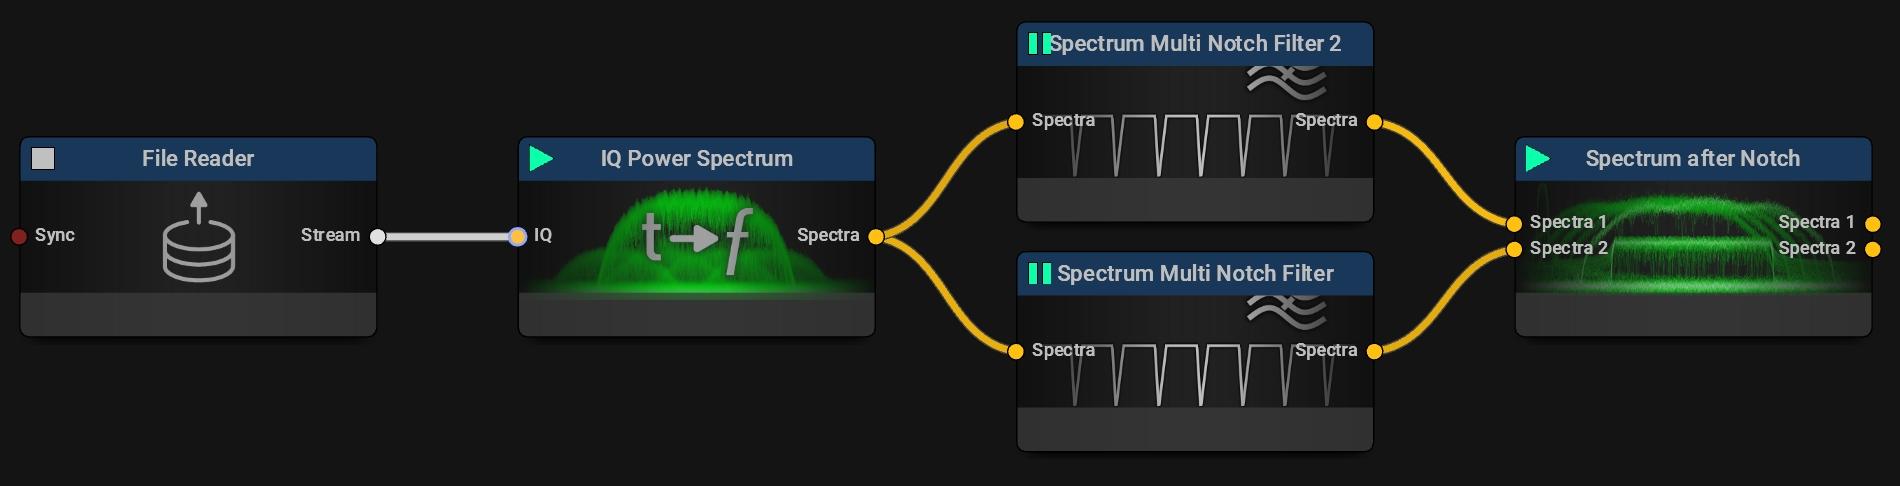 Comparing Different Notch Filter Setups